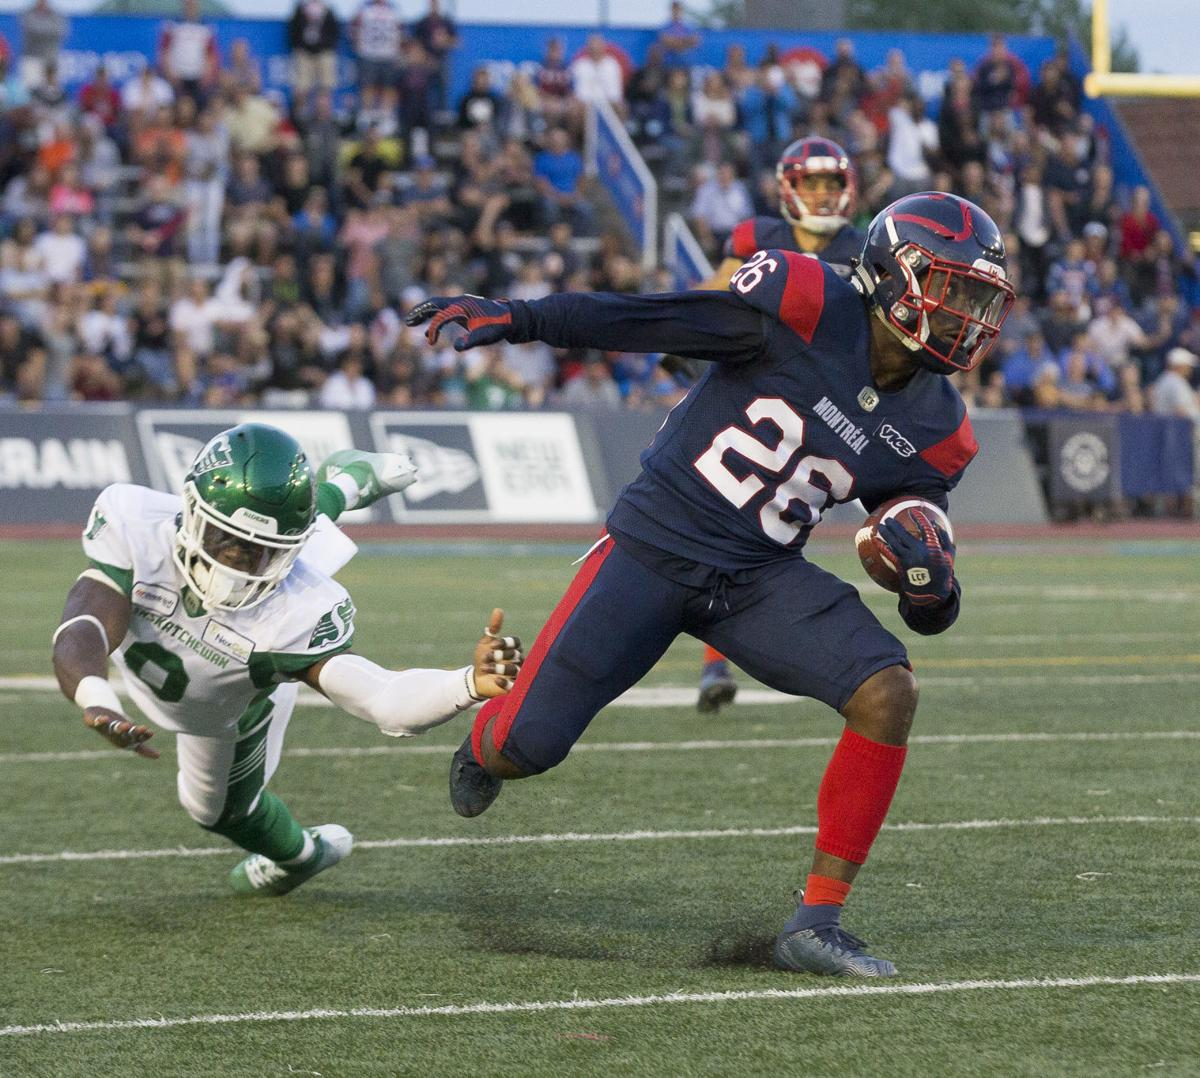 Alouettes thunderstruck in loss to Saskatchewan